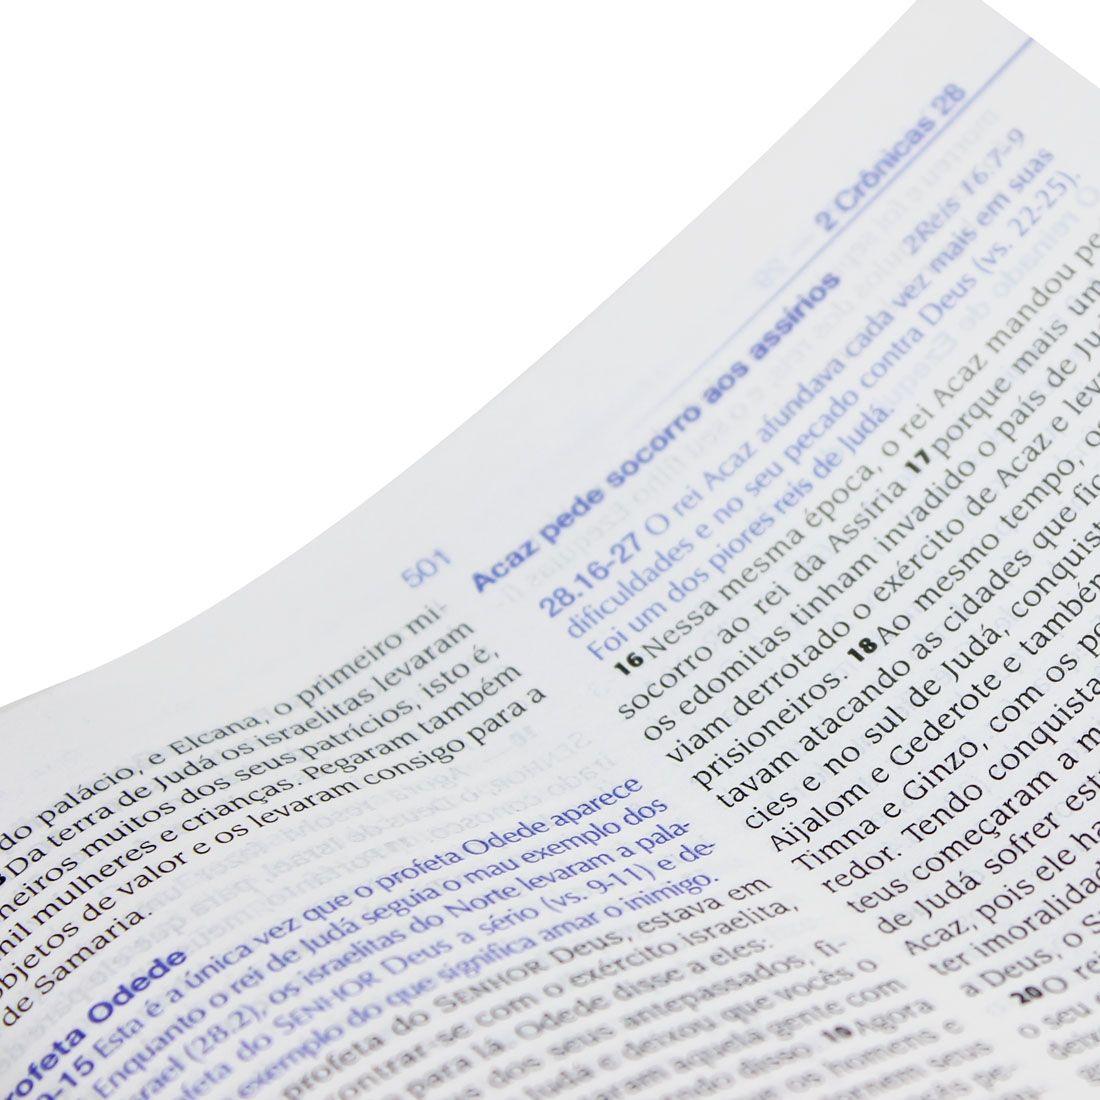 Bíblia De Estudo NTLH Linguagem Fácil Formato Grande Capa Luxo Azul